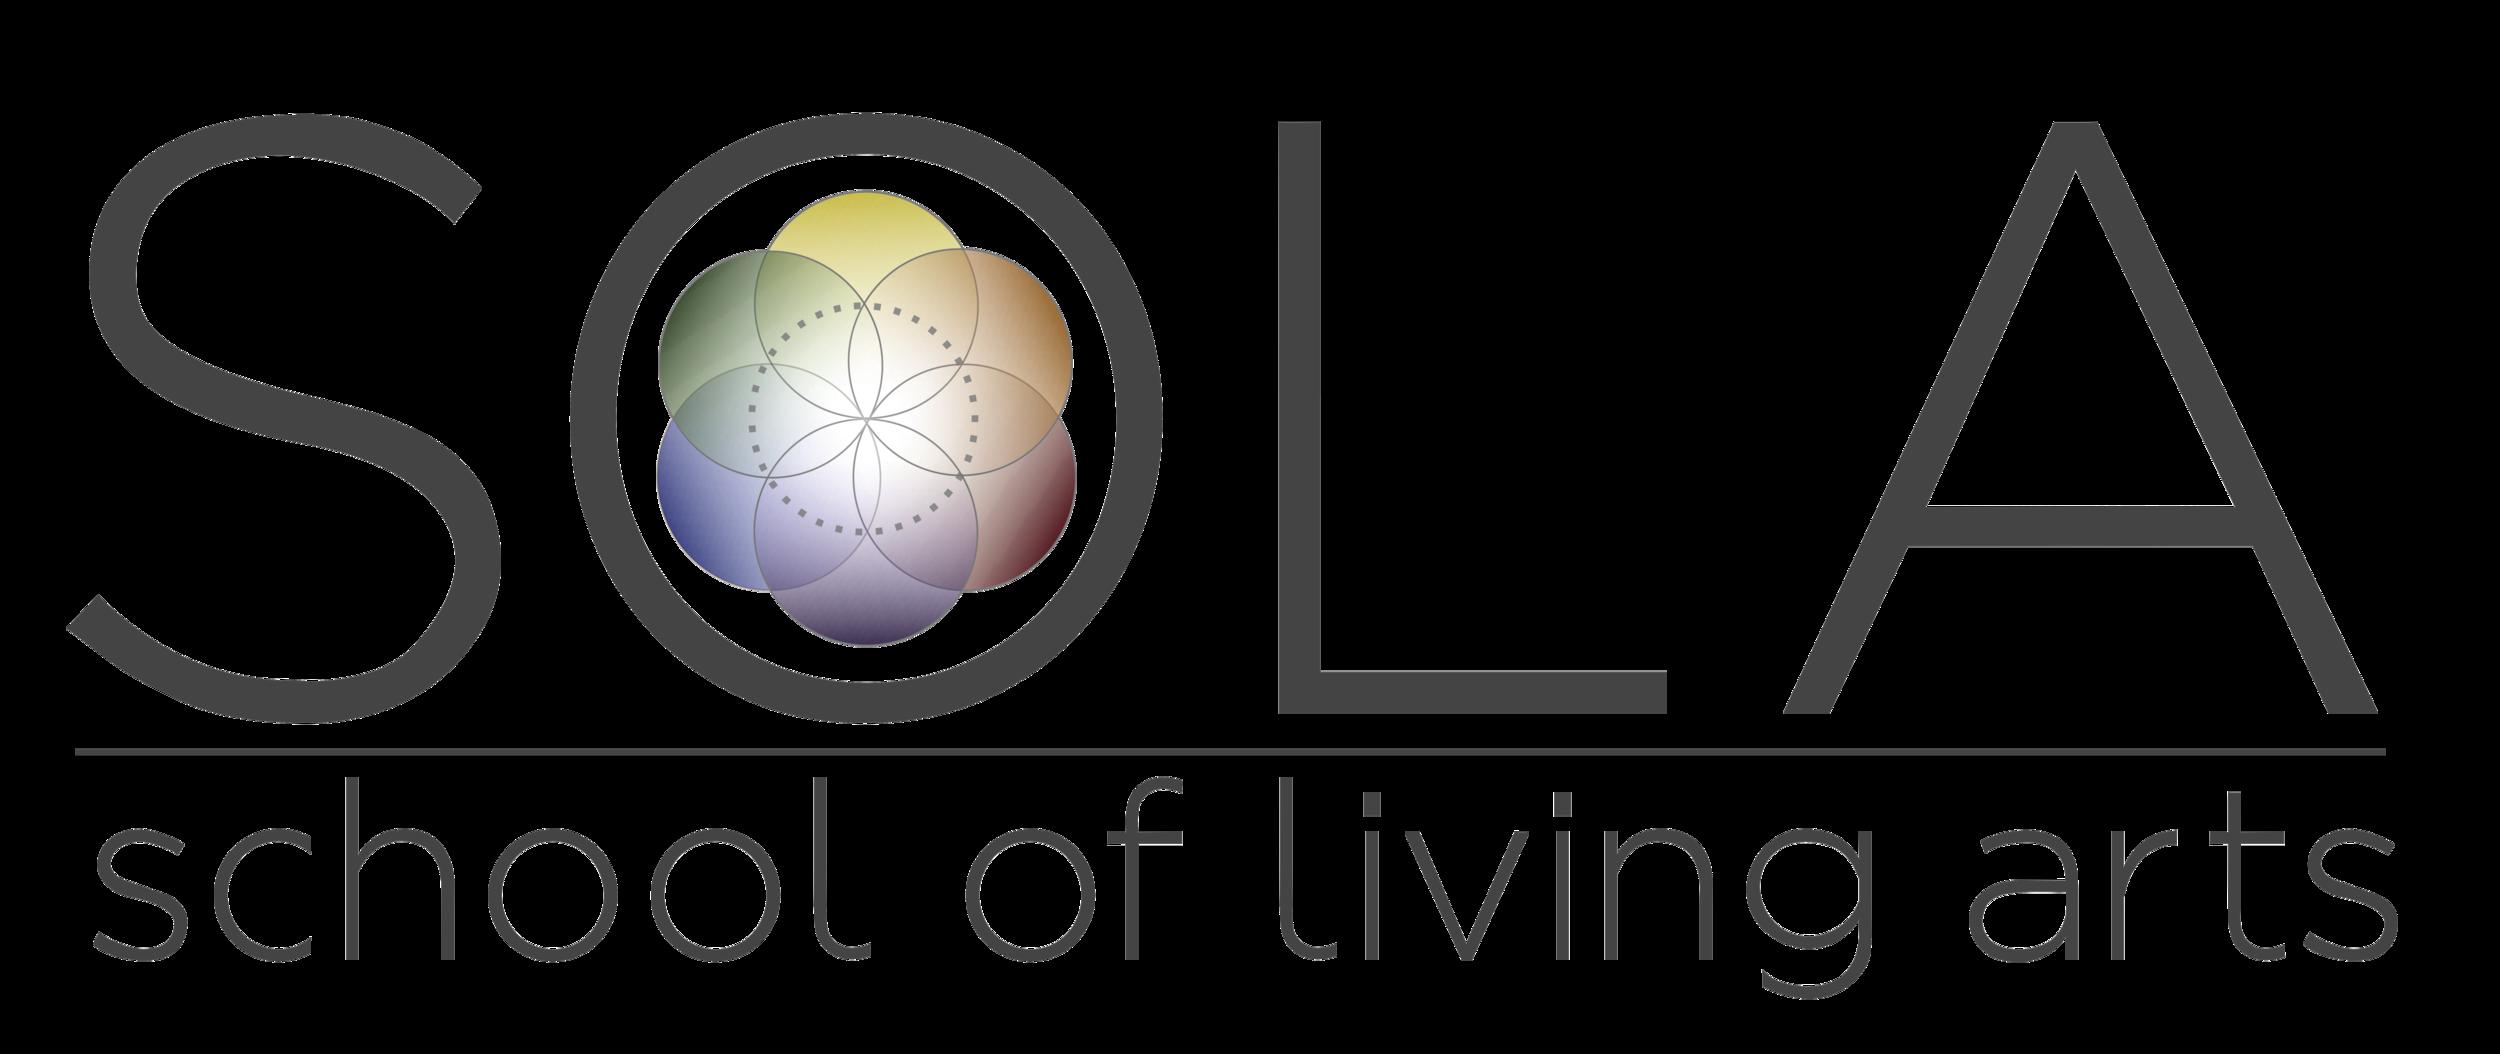 SOLA Logo 11.8.18.png